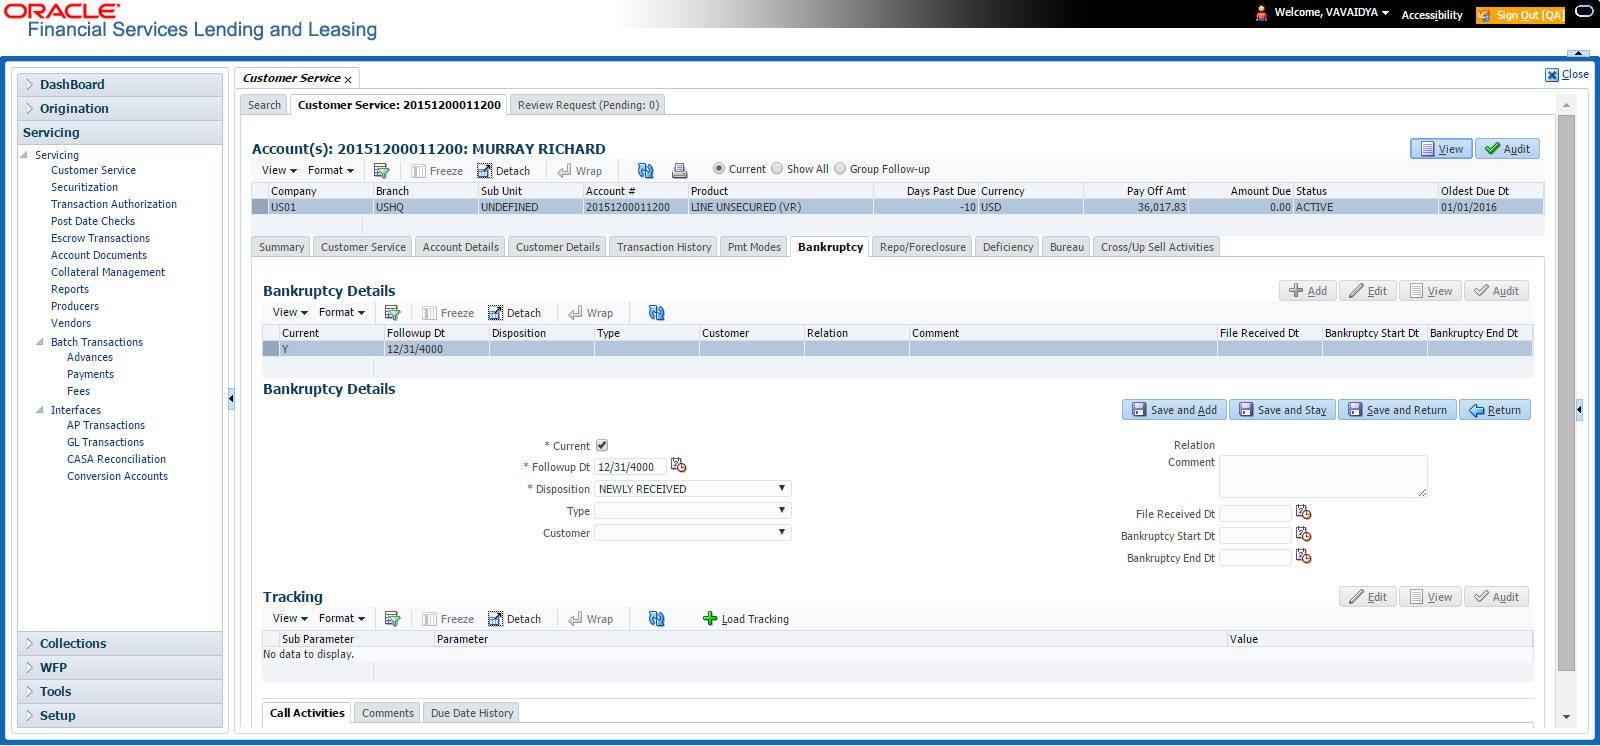 Ru/customer/account - Customer Service